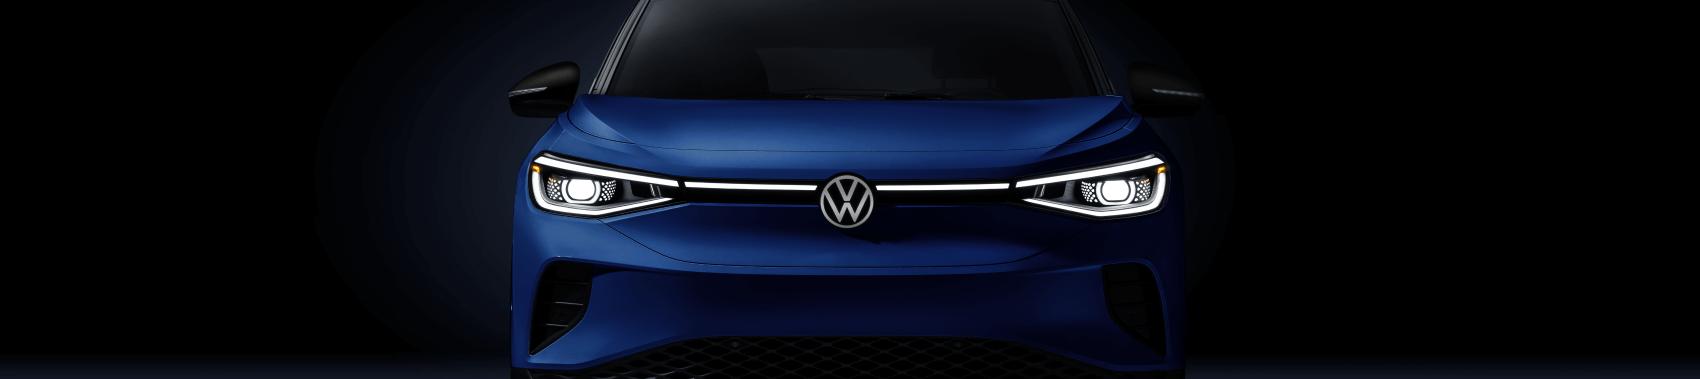 2021 Volkswagen ID.4 EV Blue Norm Reeves Superstore